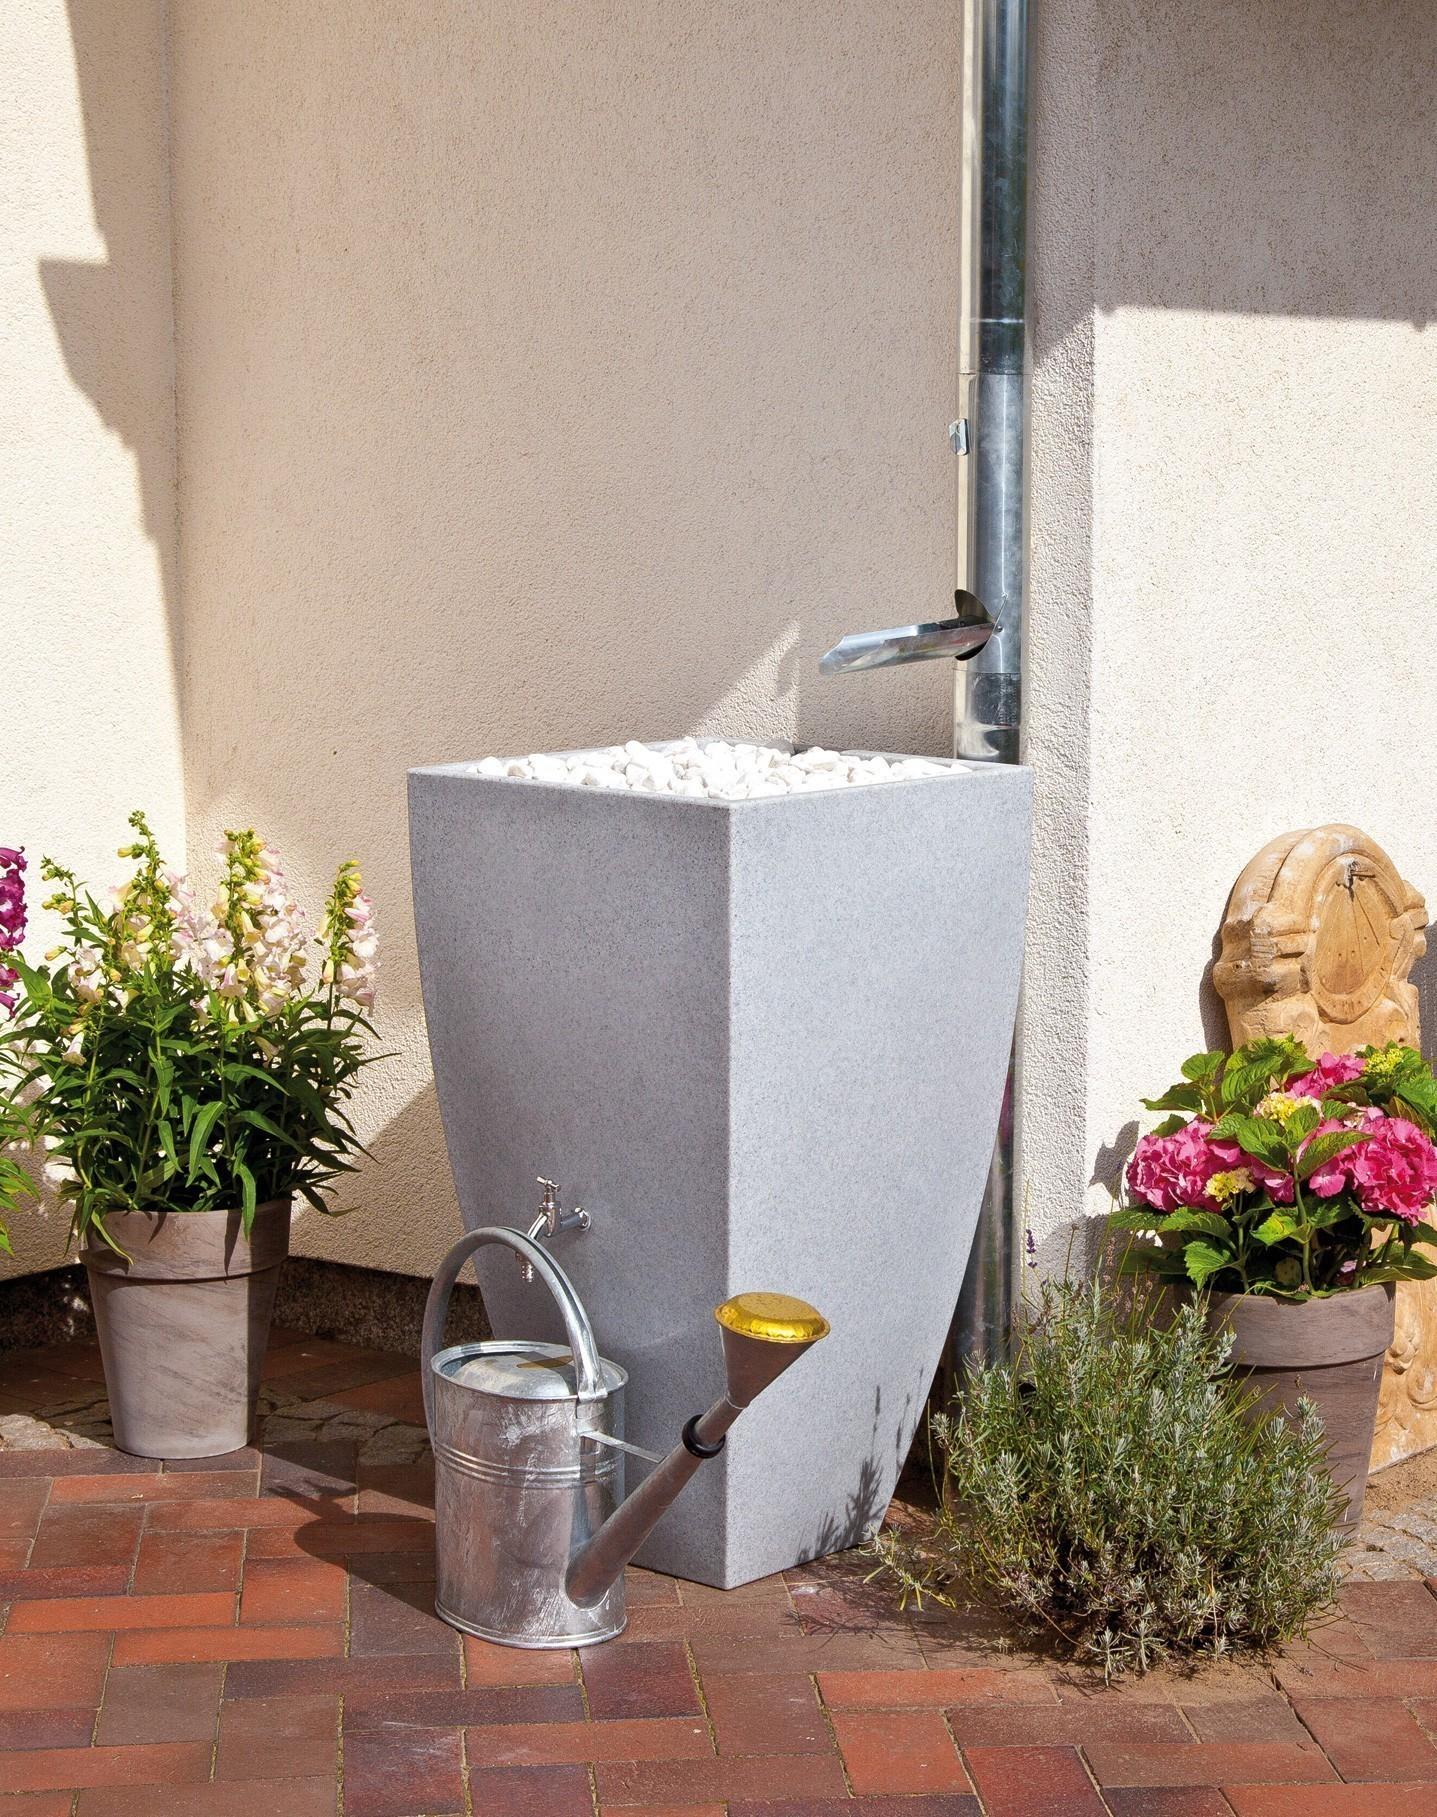 Regentonne / Regenwassertank Premier Tech Aqua Modena 350 L granit Bild 1